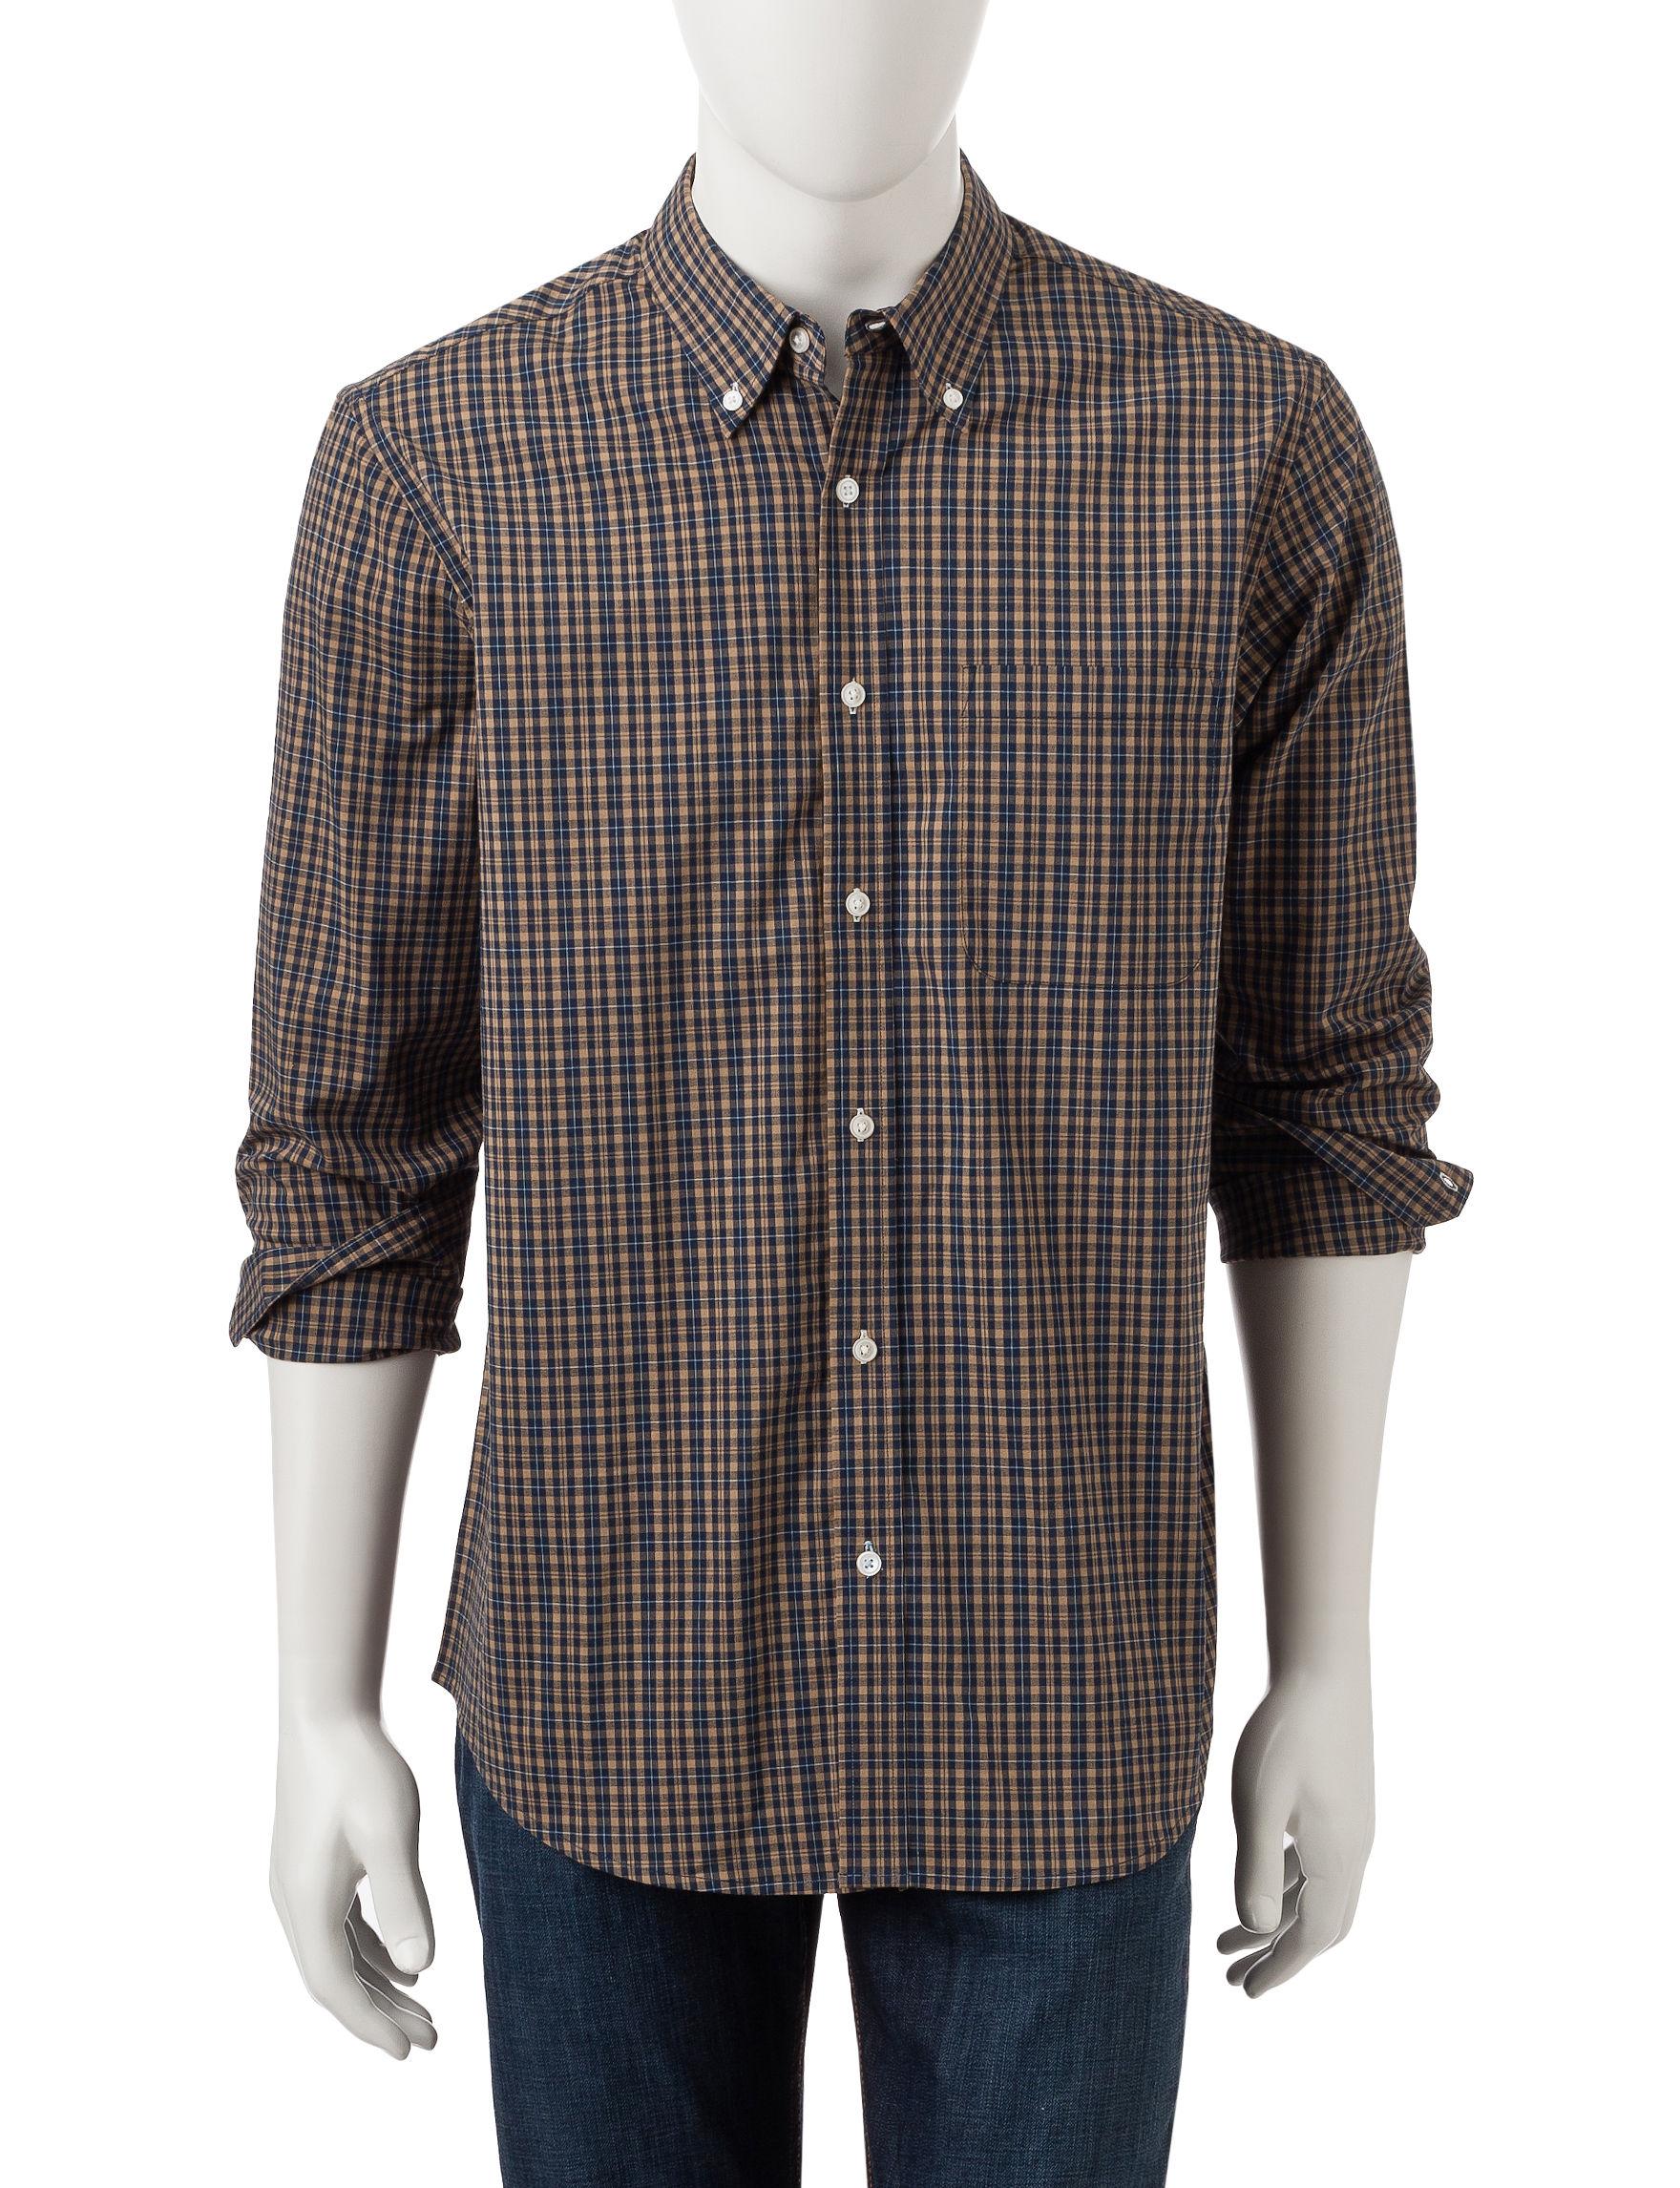 Sun River Khaki Casual Button Down Shirts